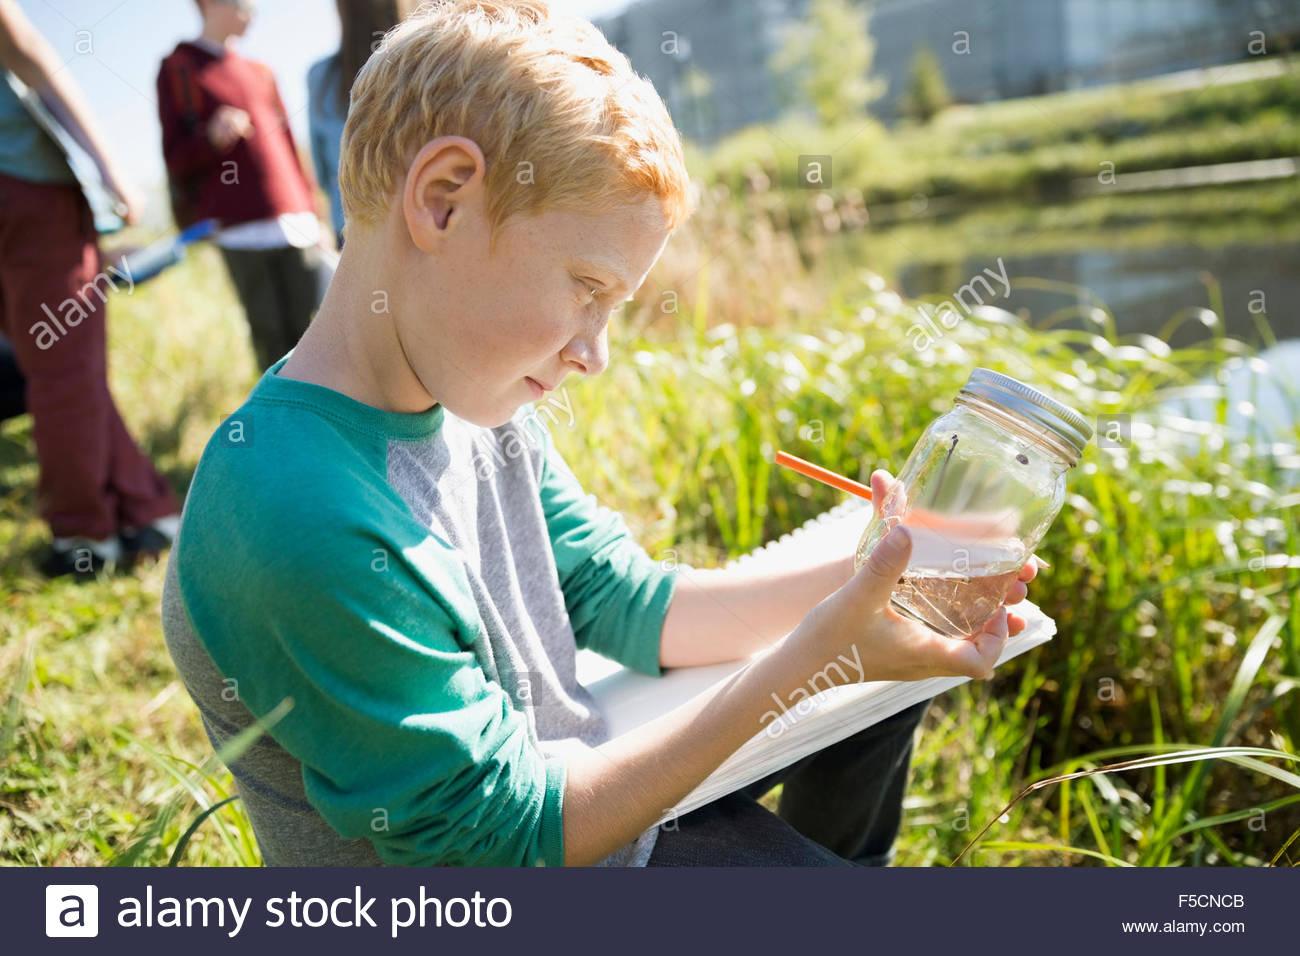 Curious schoolboy examining jar on field trip - Stock Image